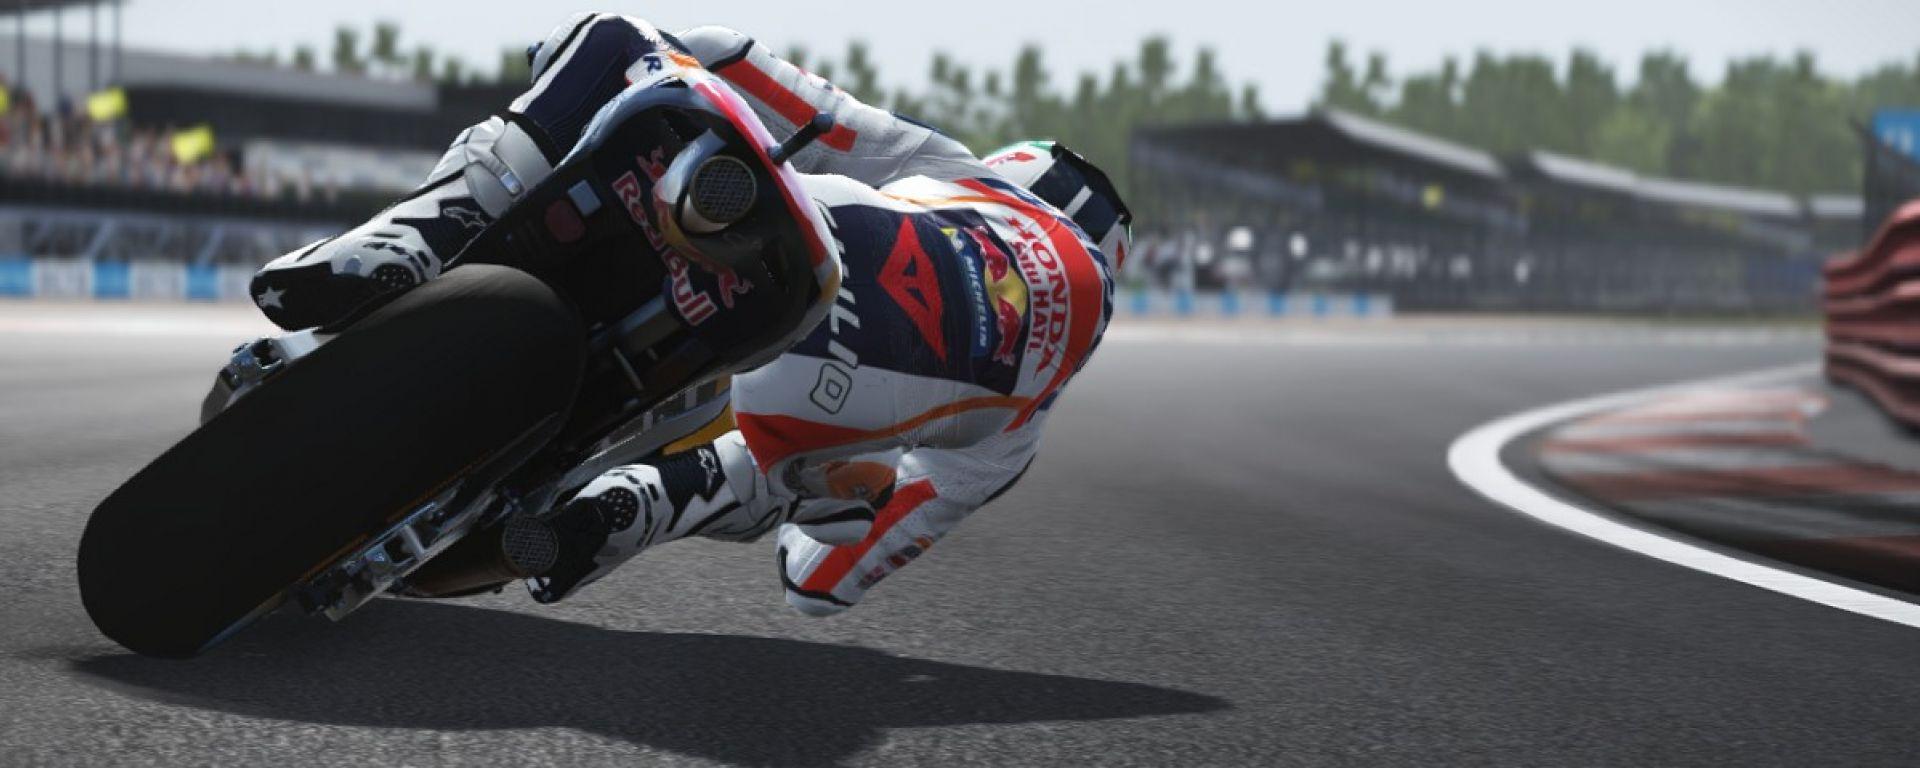 MotoGP Silverstone 2017